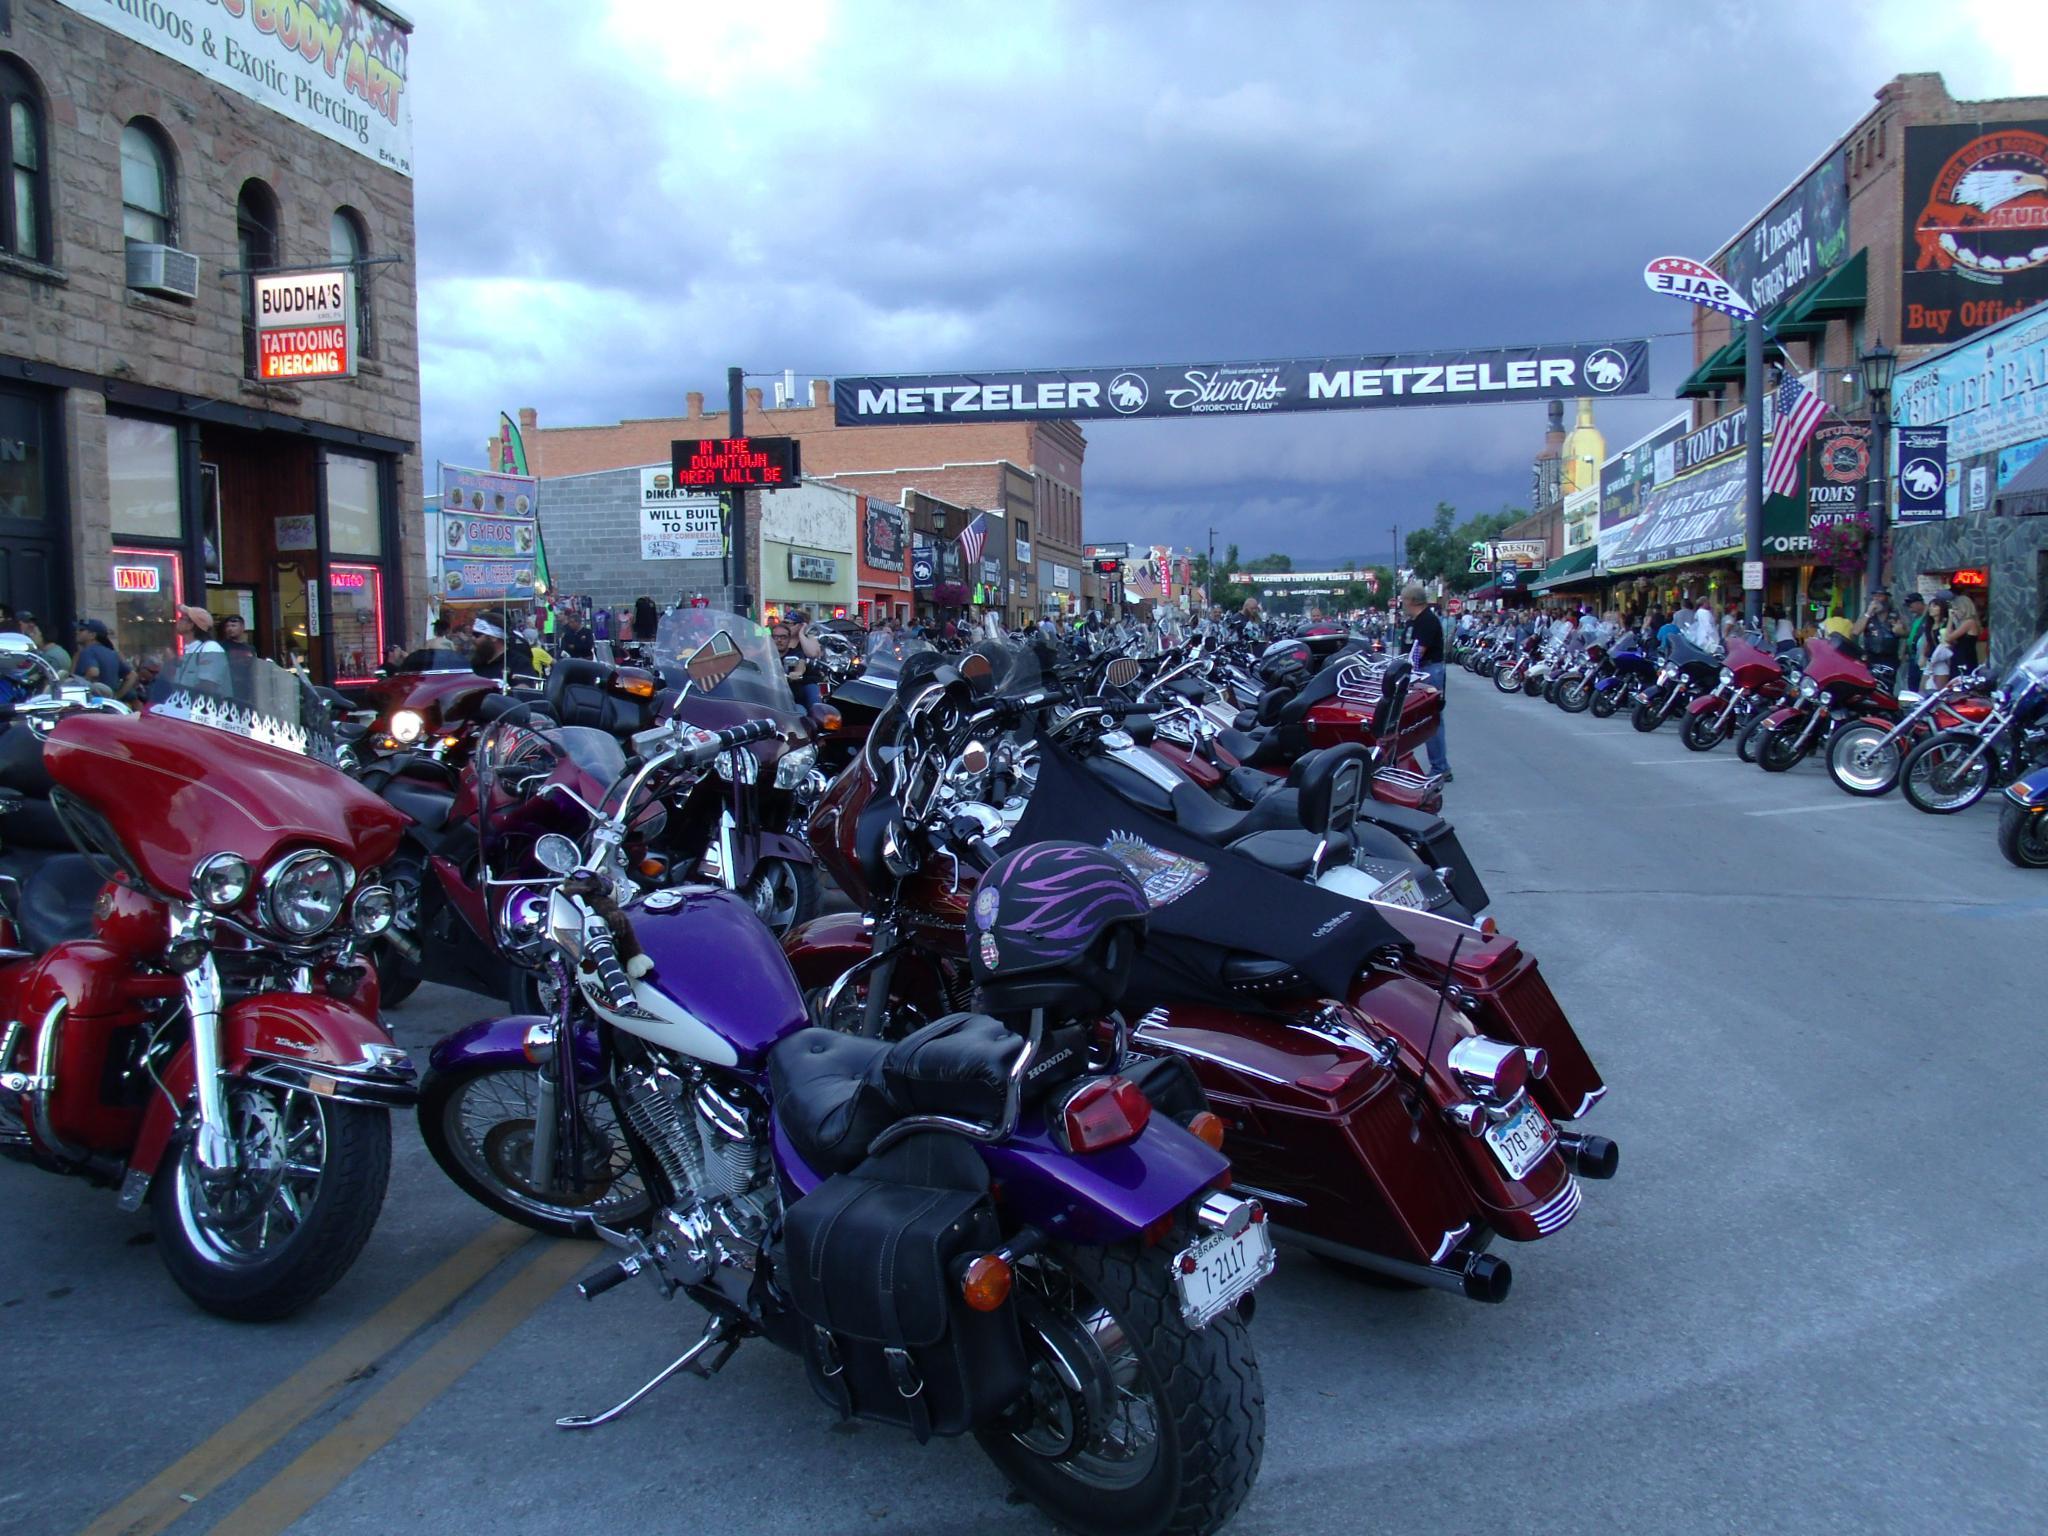 Bike Week 2014 Sturgis, South Dakota by sueherdt